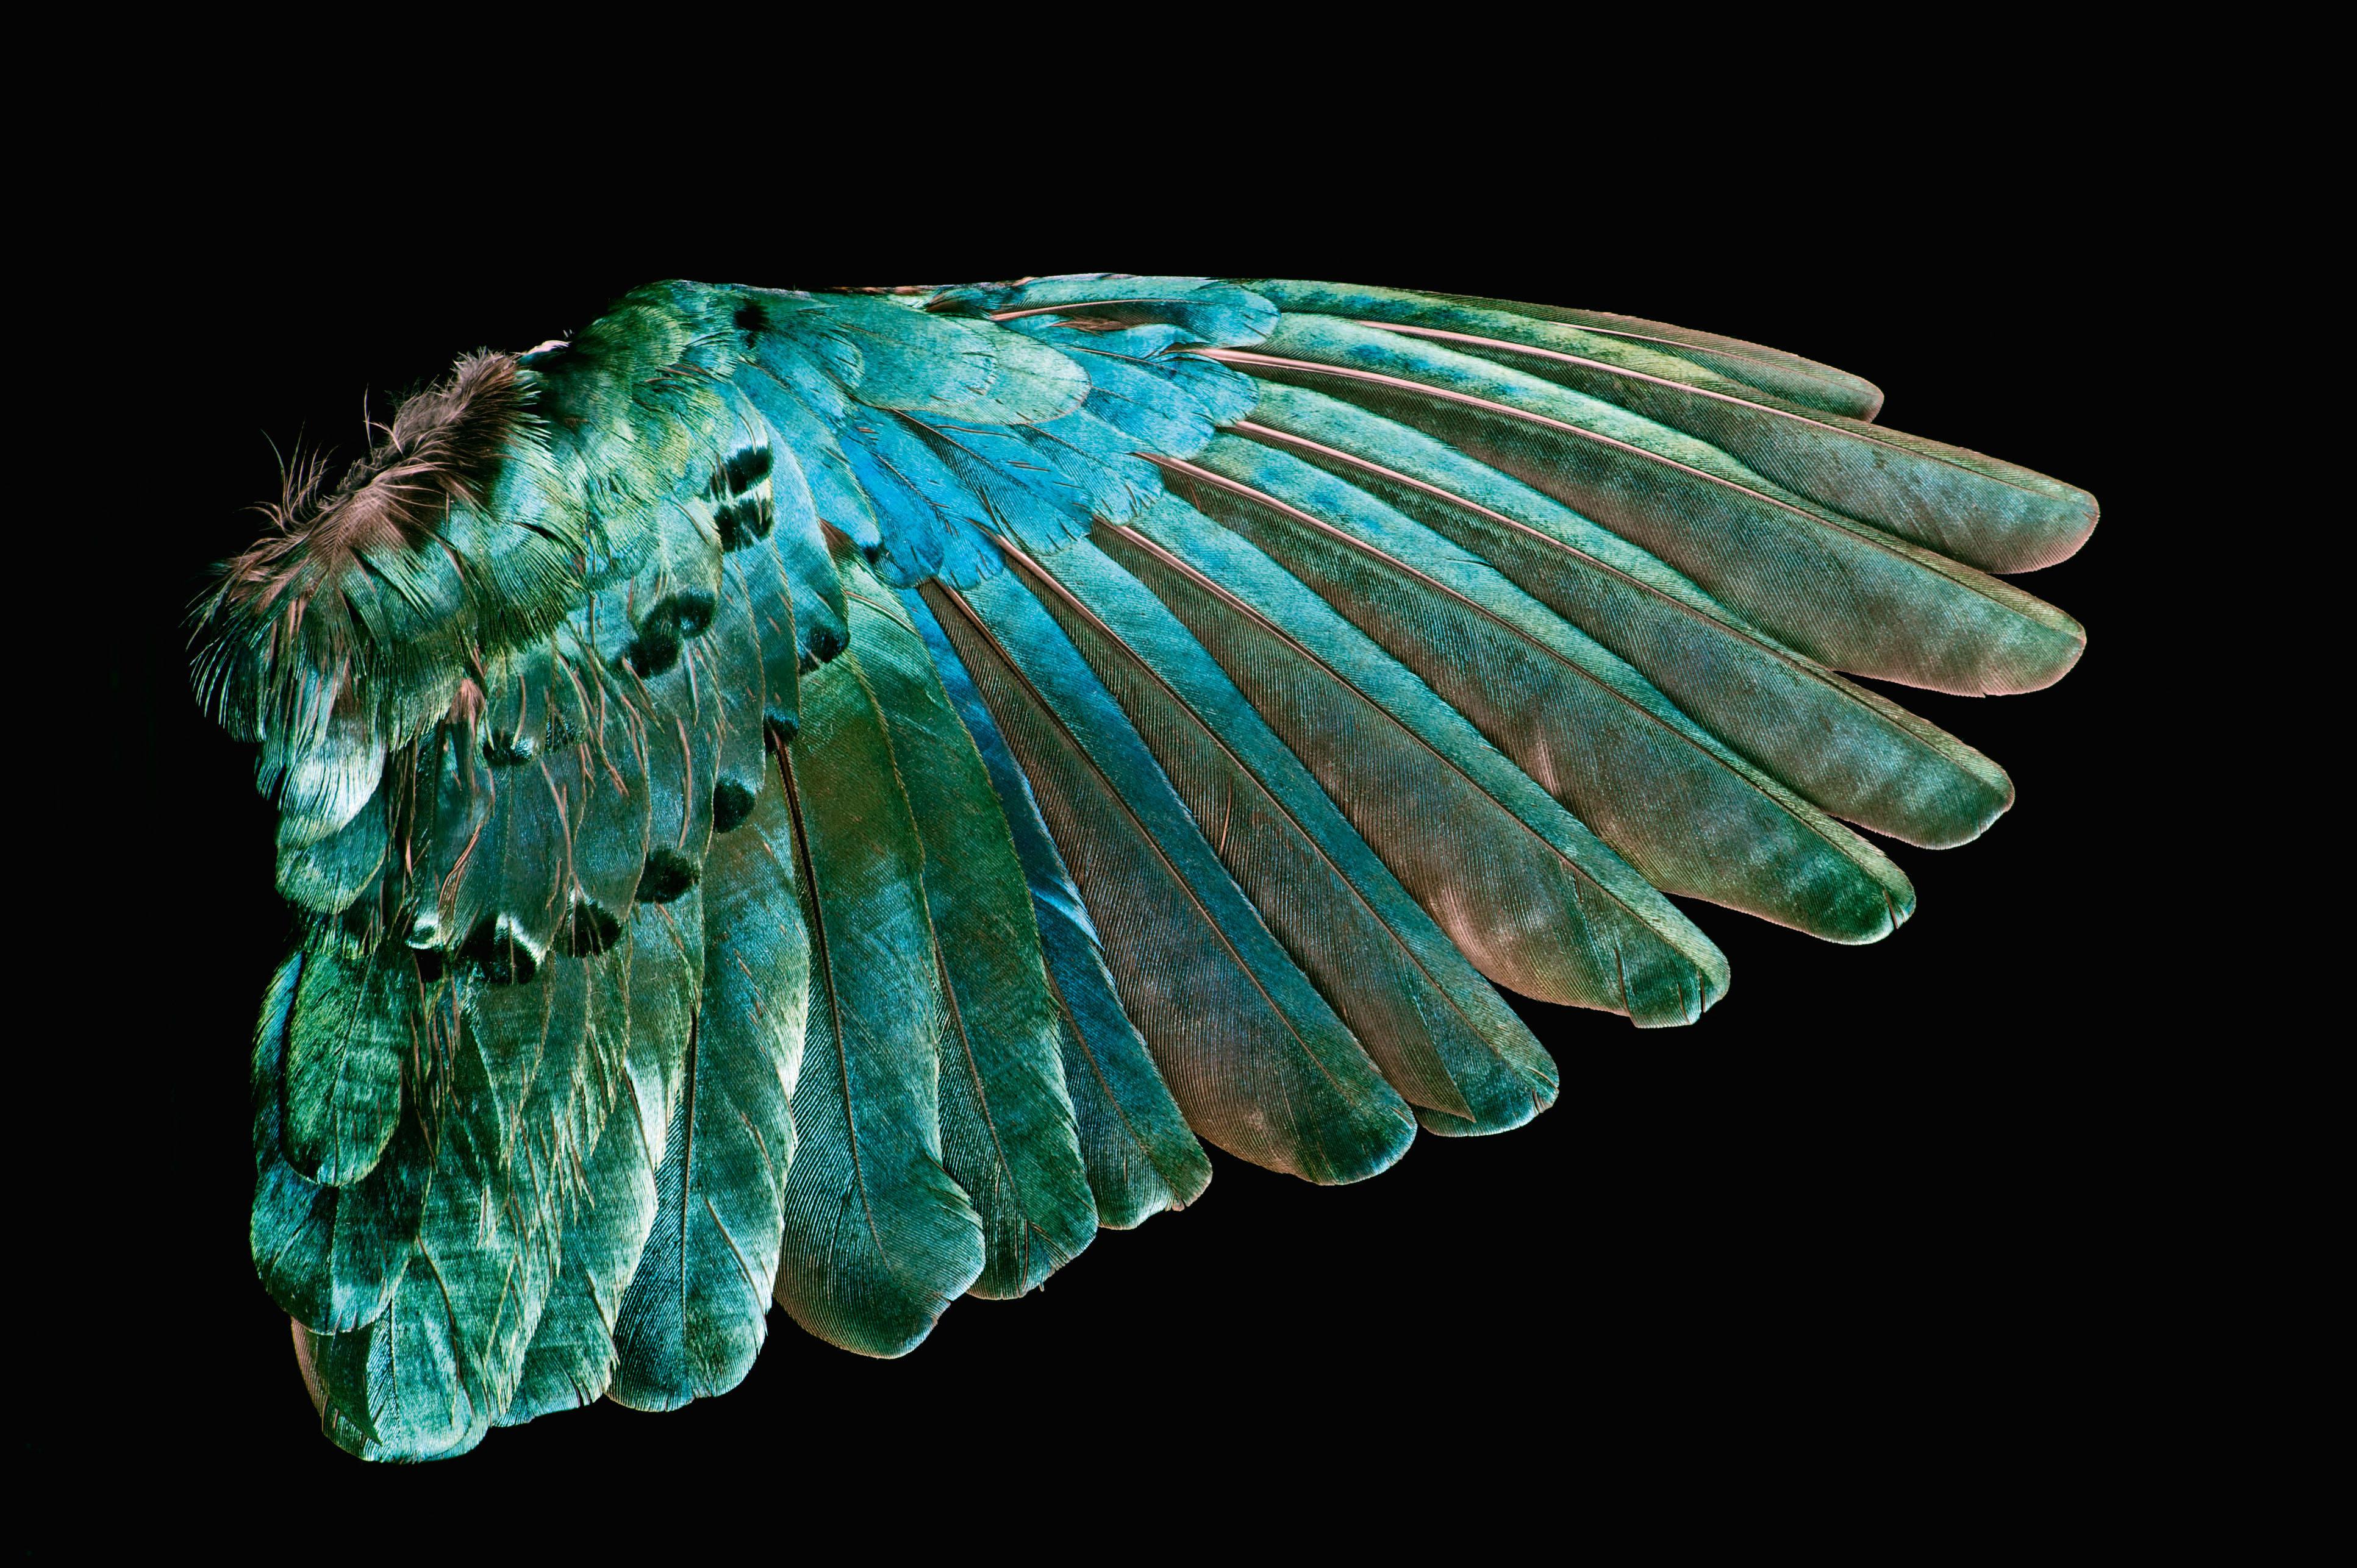 peacock bird diagram 1986 toyota mr2 radio wiring hypnotic book surveys the natural beauty of wild